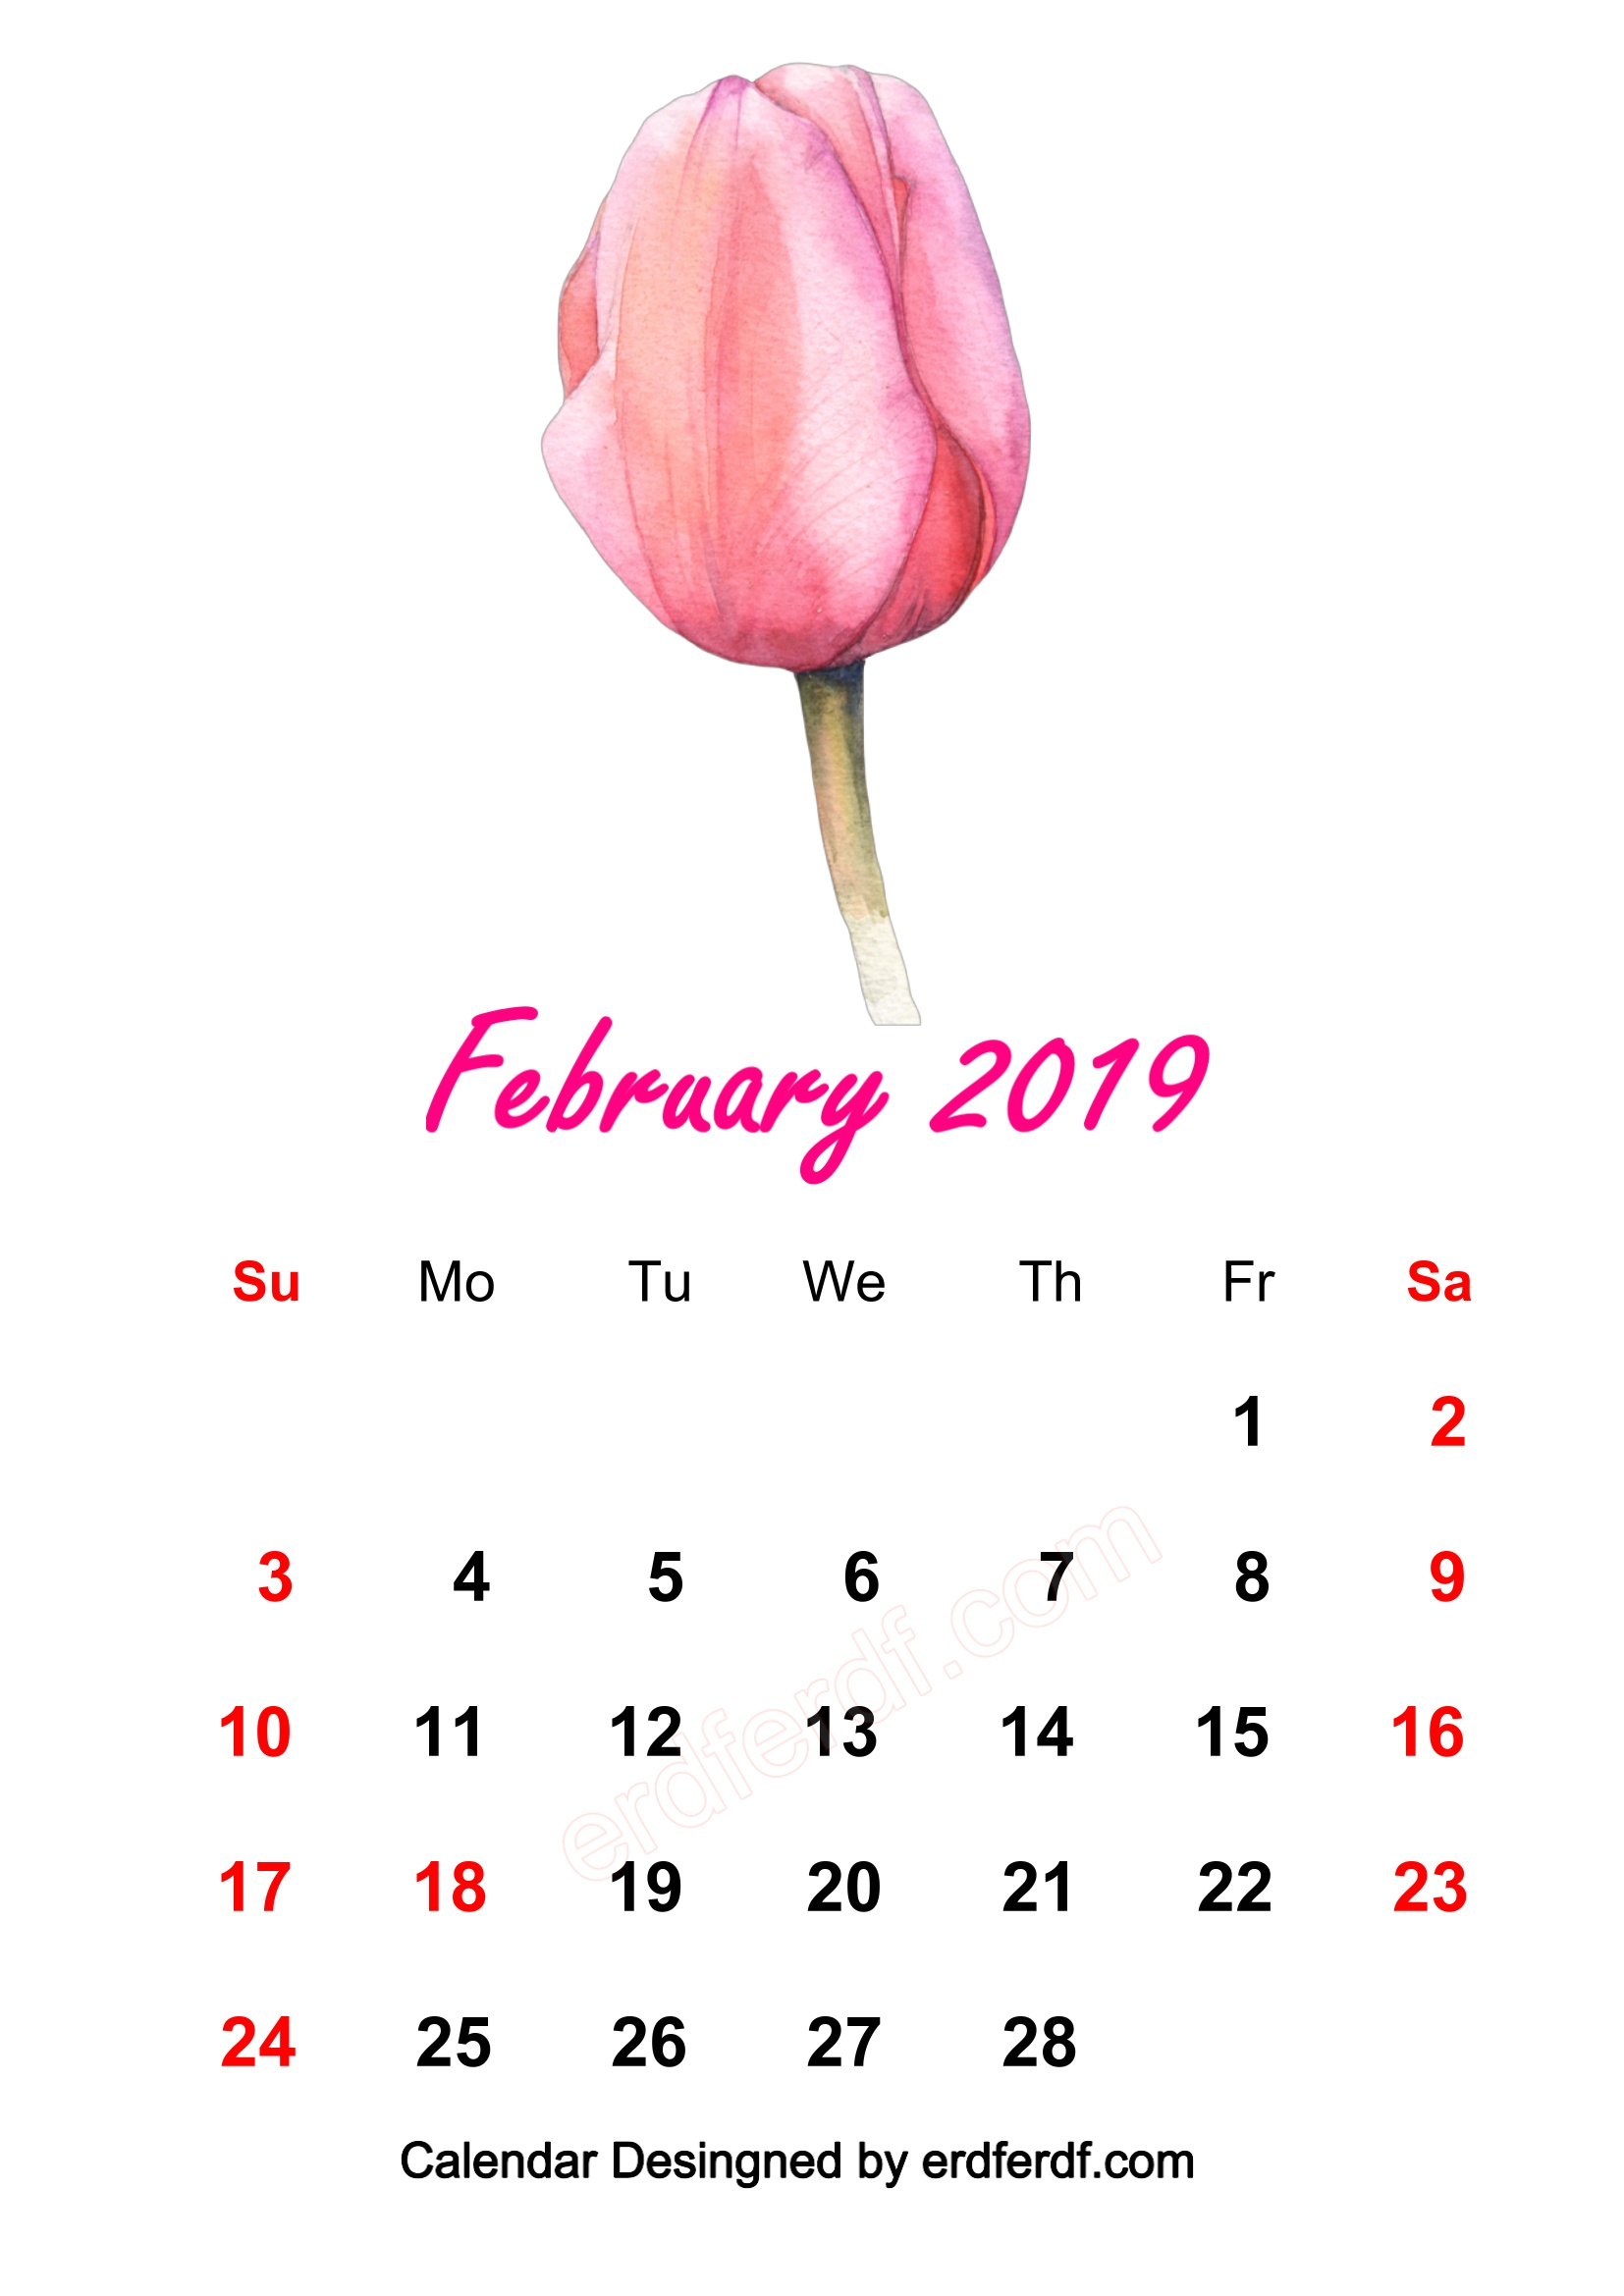 2 February 2019 HD Calendar Wallpapers Watercolor